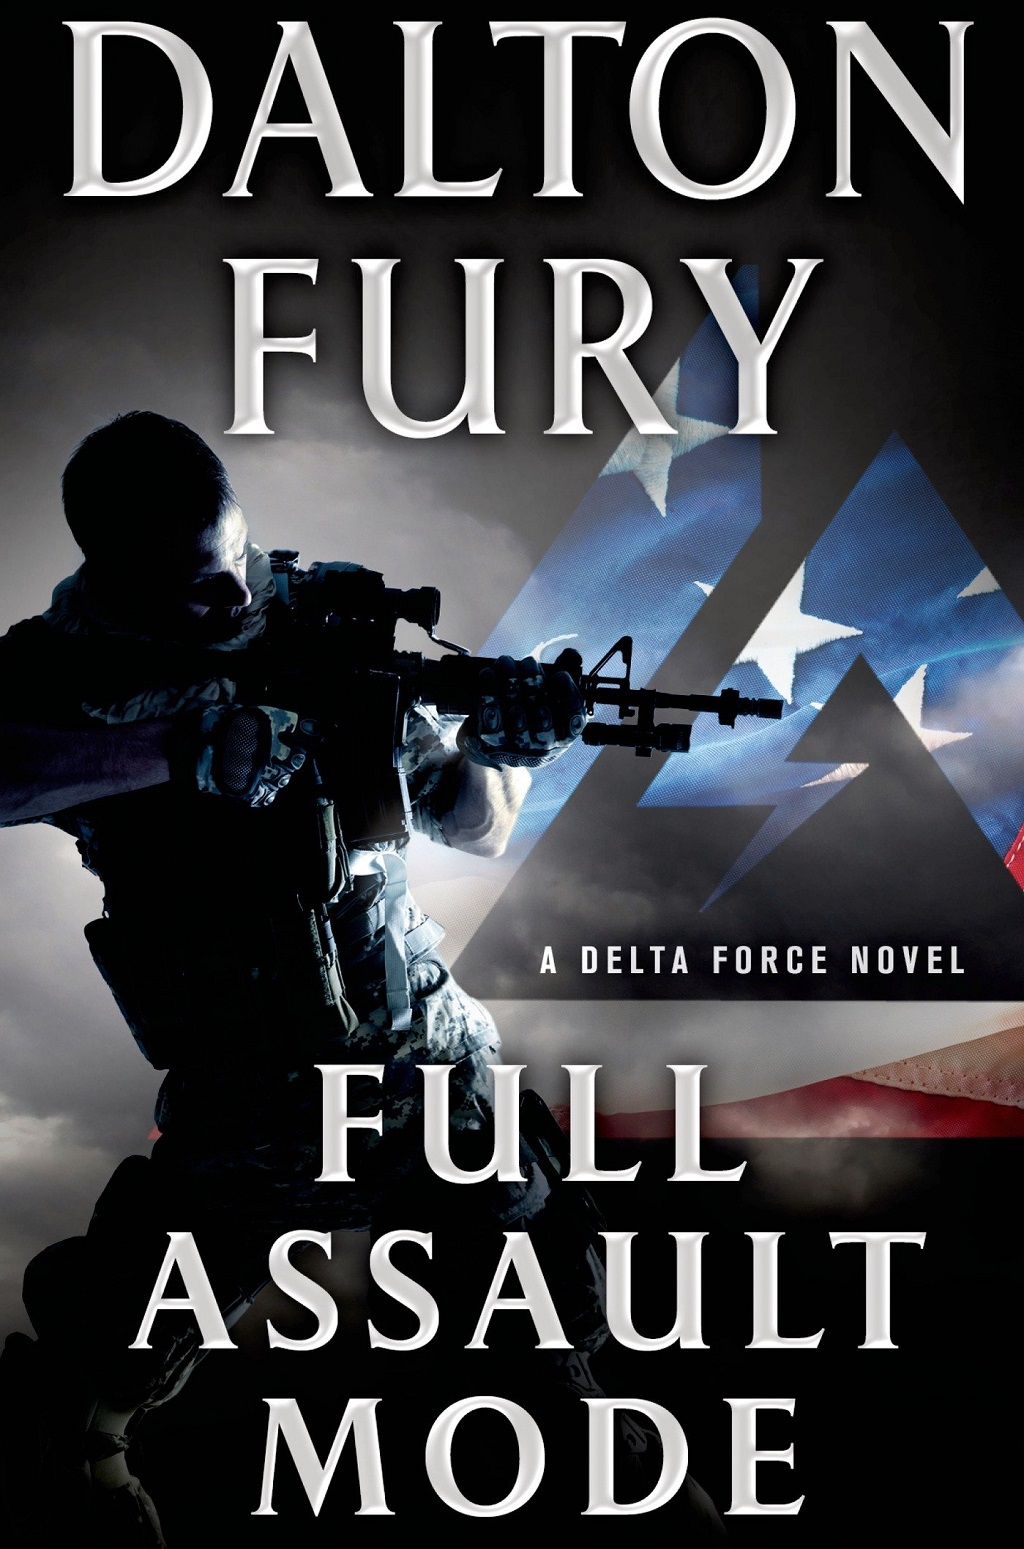 Full Assault Mode Audiobook Free Download and Listen